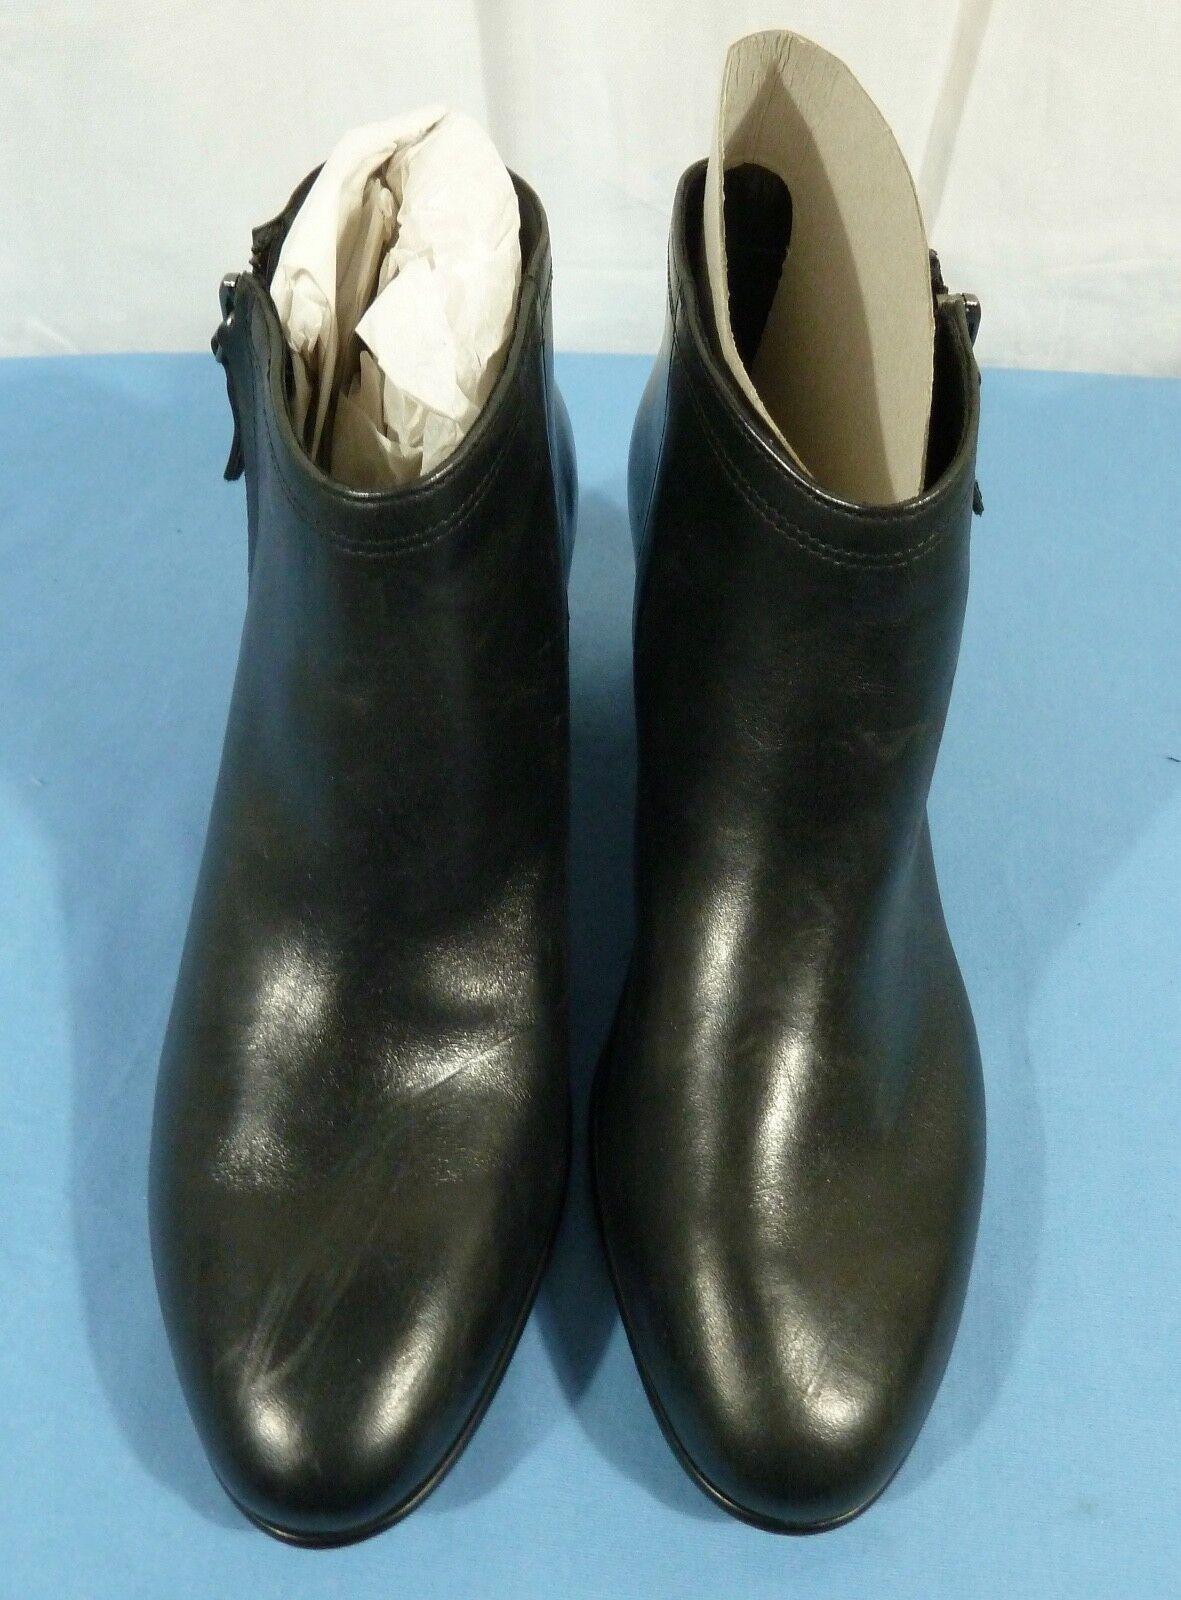 CLARKS Women's Maypearl Alice Ankle Bootie Size US 9